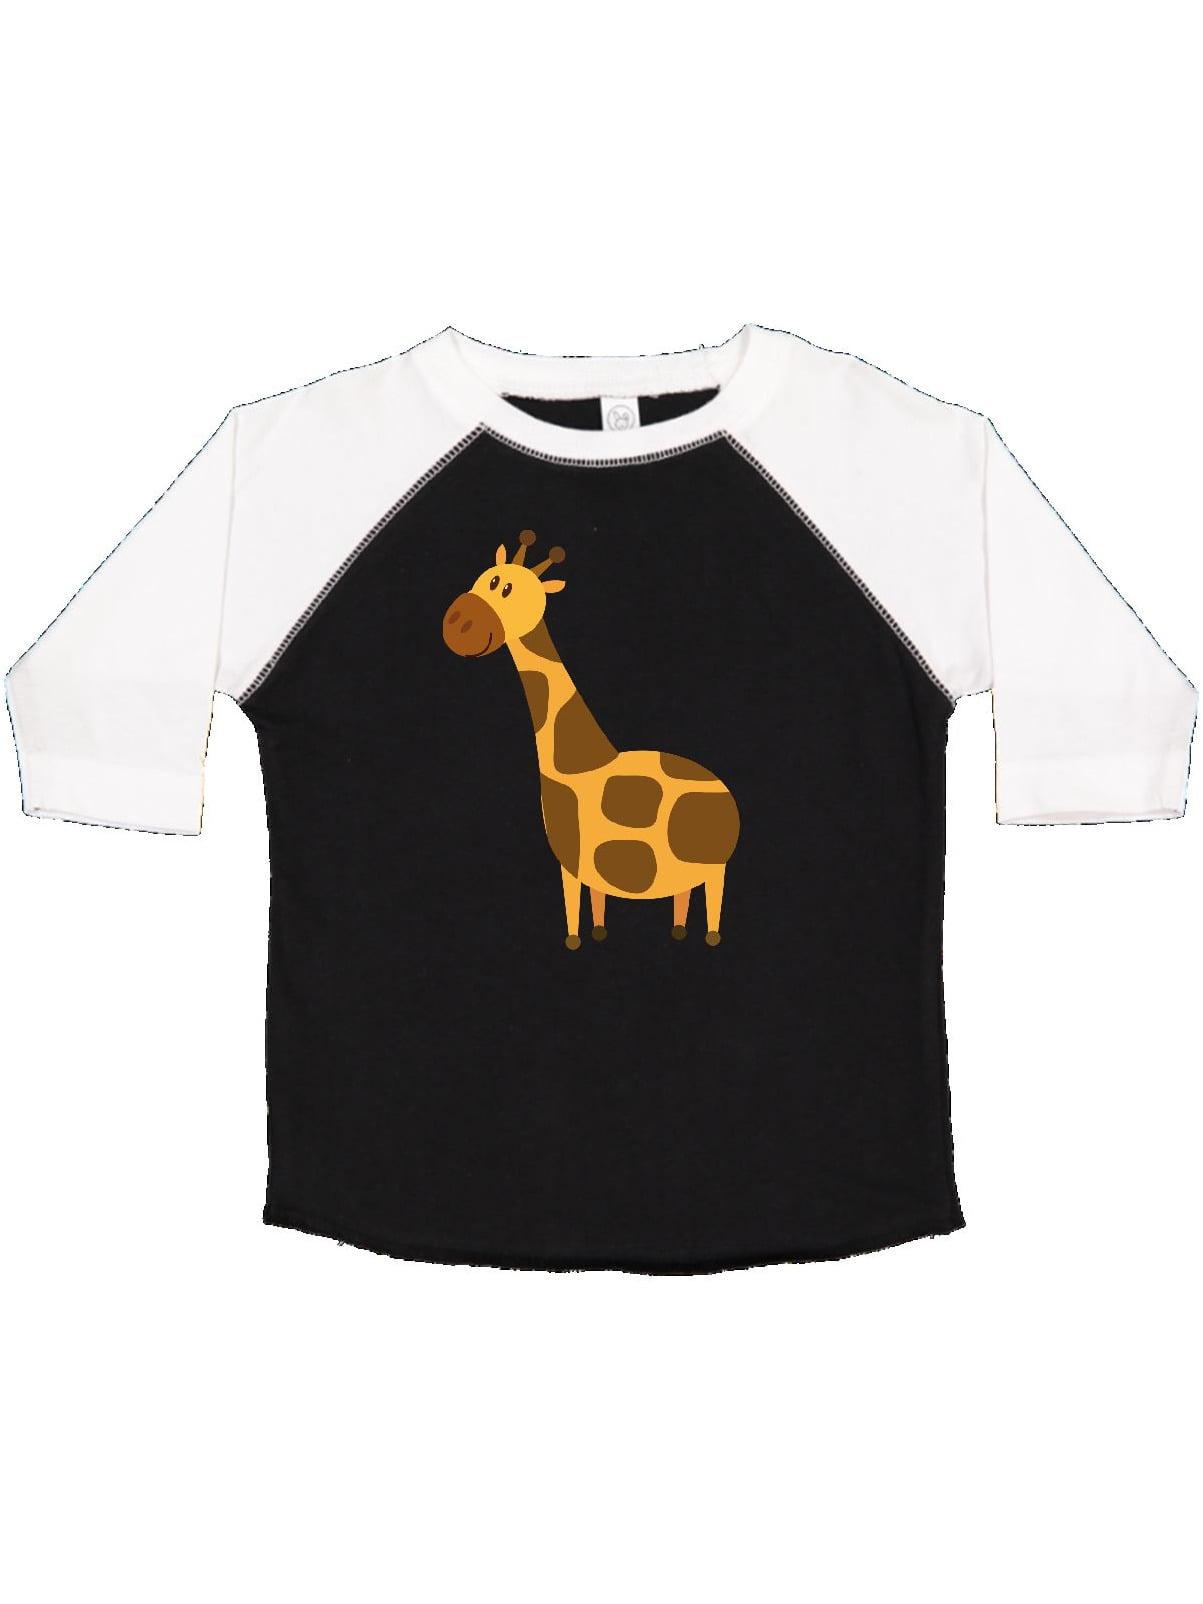 Inktastic Giraffe Jungle Zoo Animal T-Shirt Animals Cute Kids Funny Mens Adult